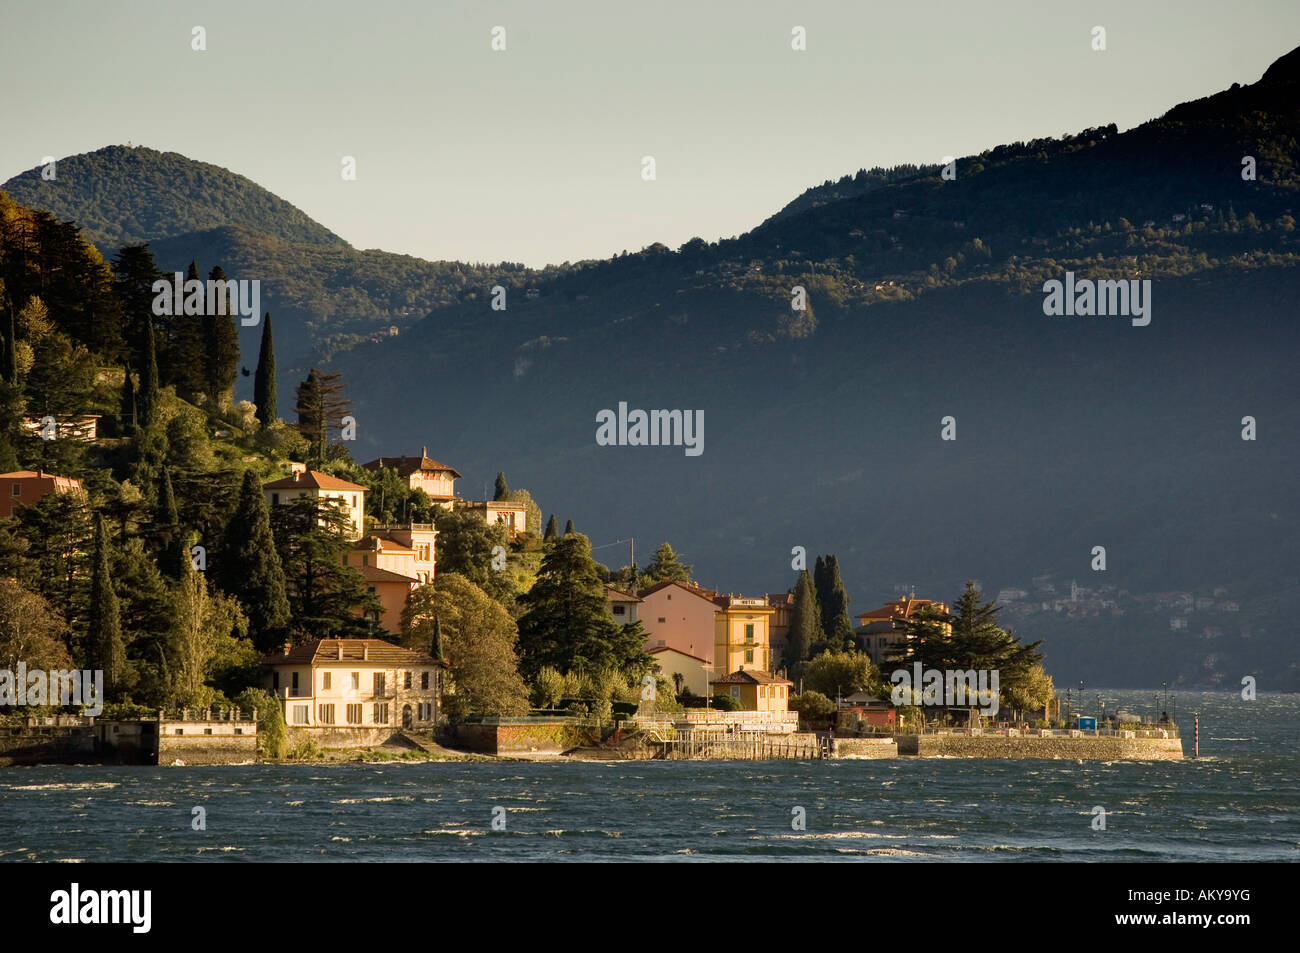 Varenna, lake of Como, Lombardia, Italy - Stock Image